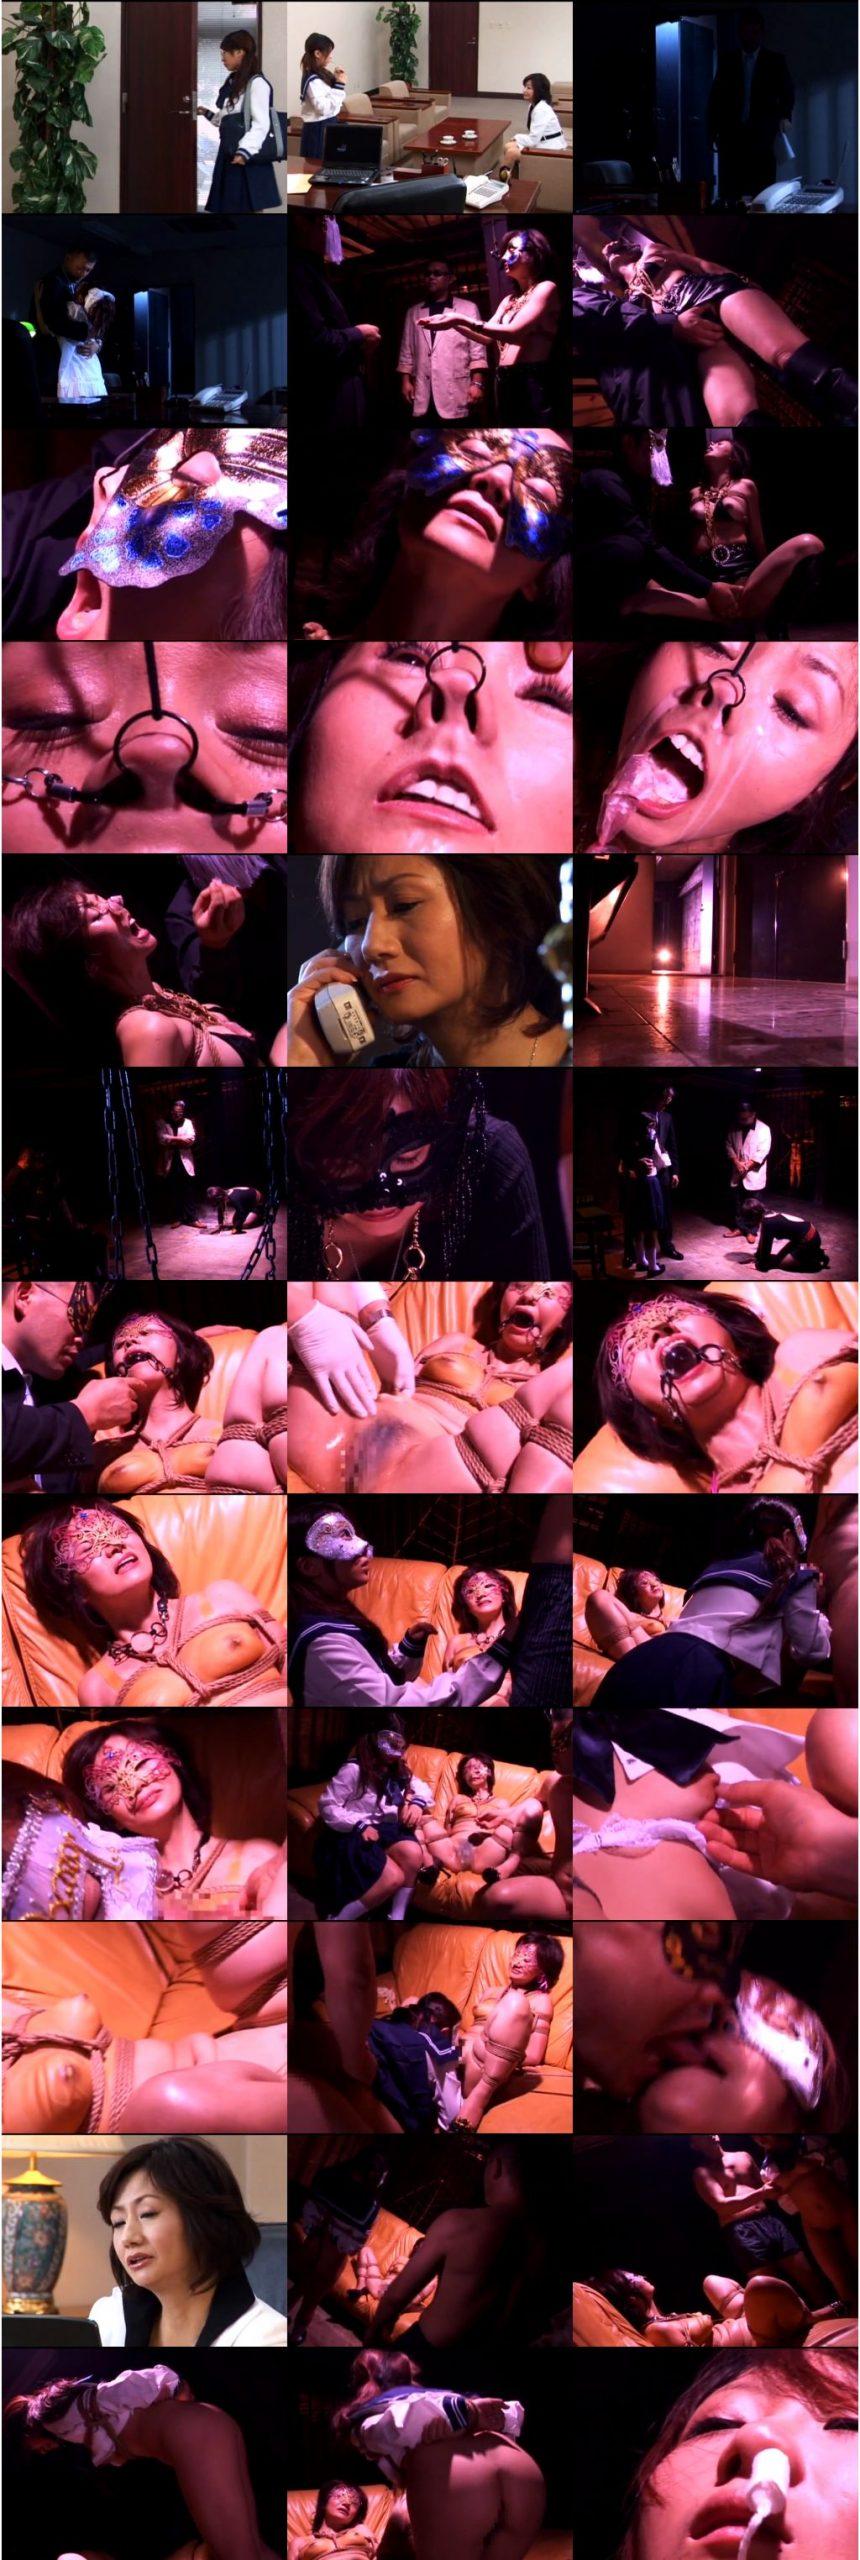 dd 304a s scaled - [DD-304] Yoshida Aya, Ai Hoshieko 母娘凌辱 鼻虐の罠 Costume シネマジック 母親 輪姦・辱め